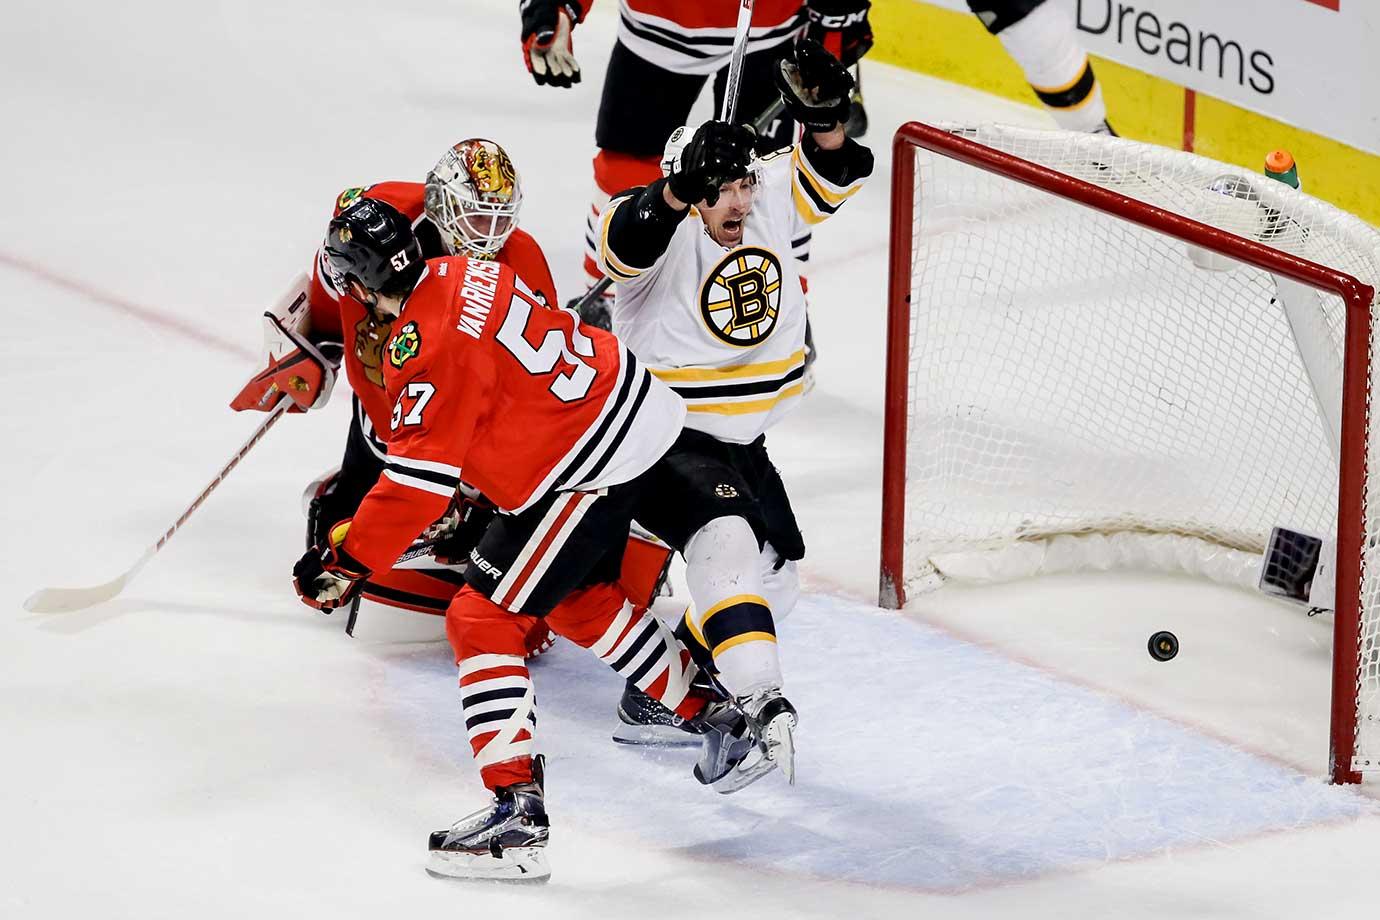 Brad Marchand of the Boston Bruins scores on goalie Scott Darling of the Chicago Blackhawks.